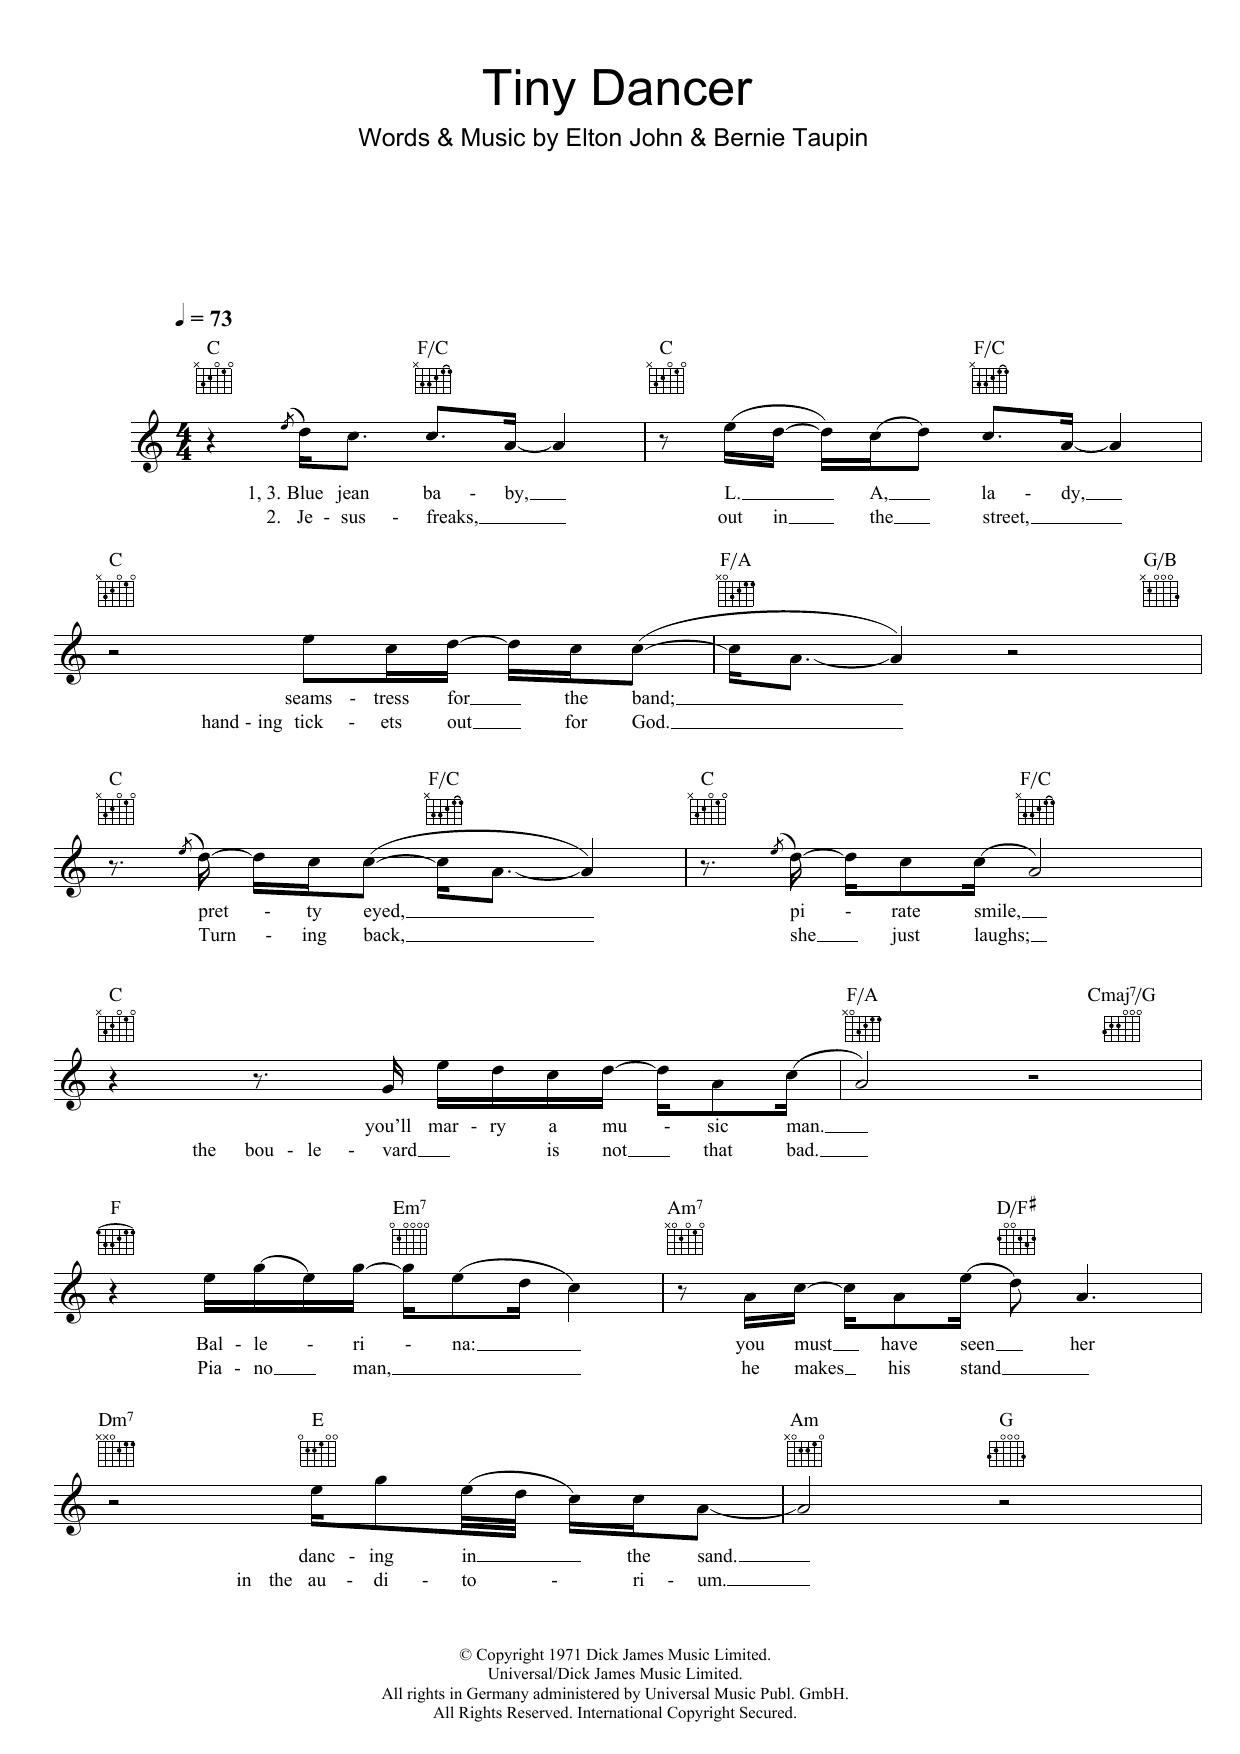 Tiny Dancer Sheet Music